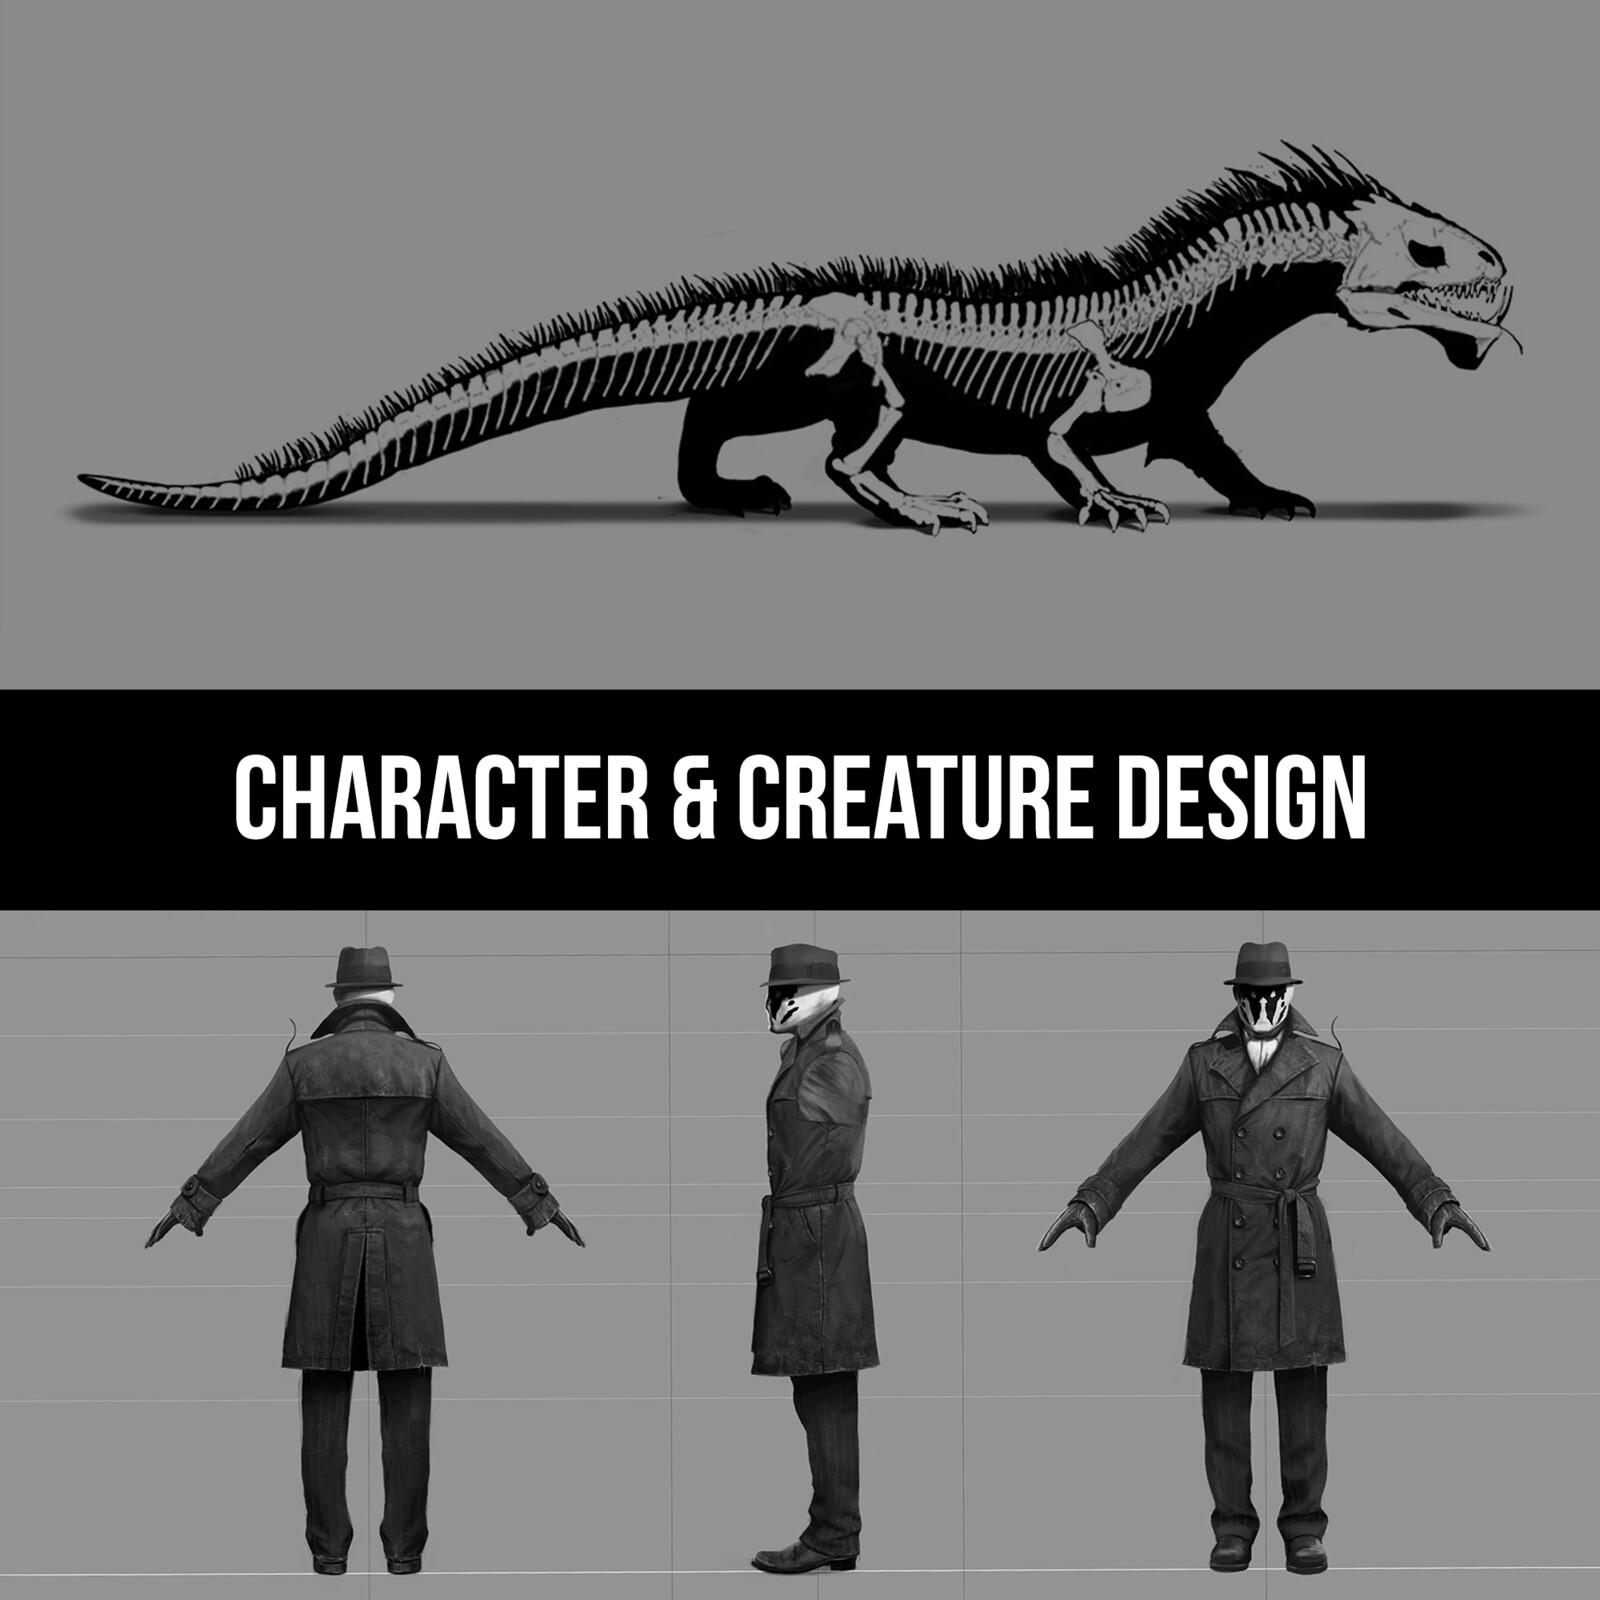 CHARACTER & CREATURE DESIGN